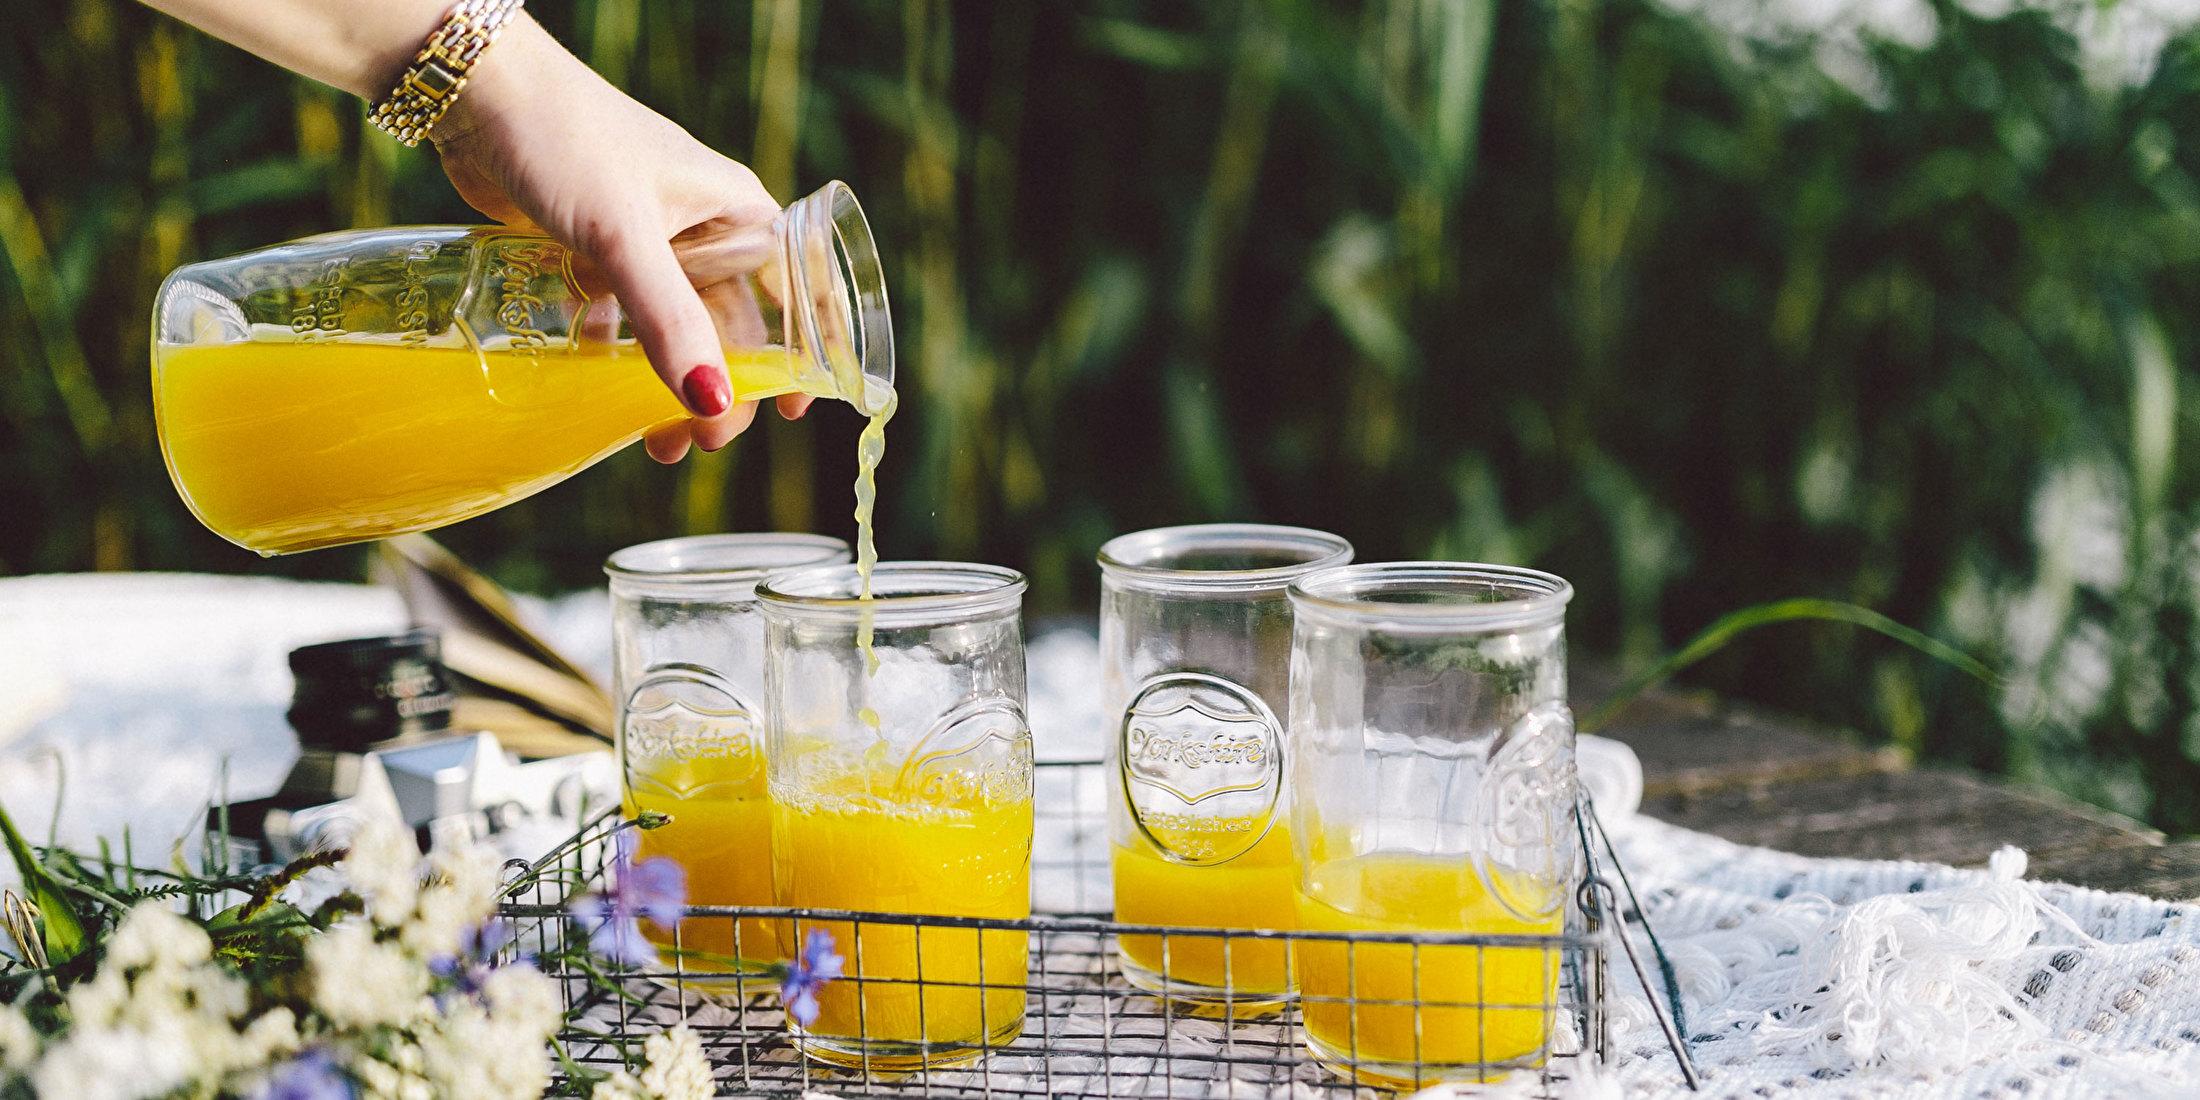 picknick juice